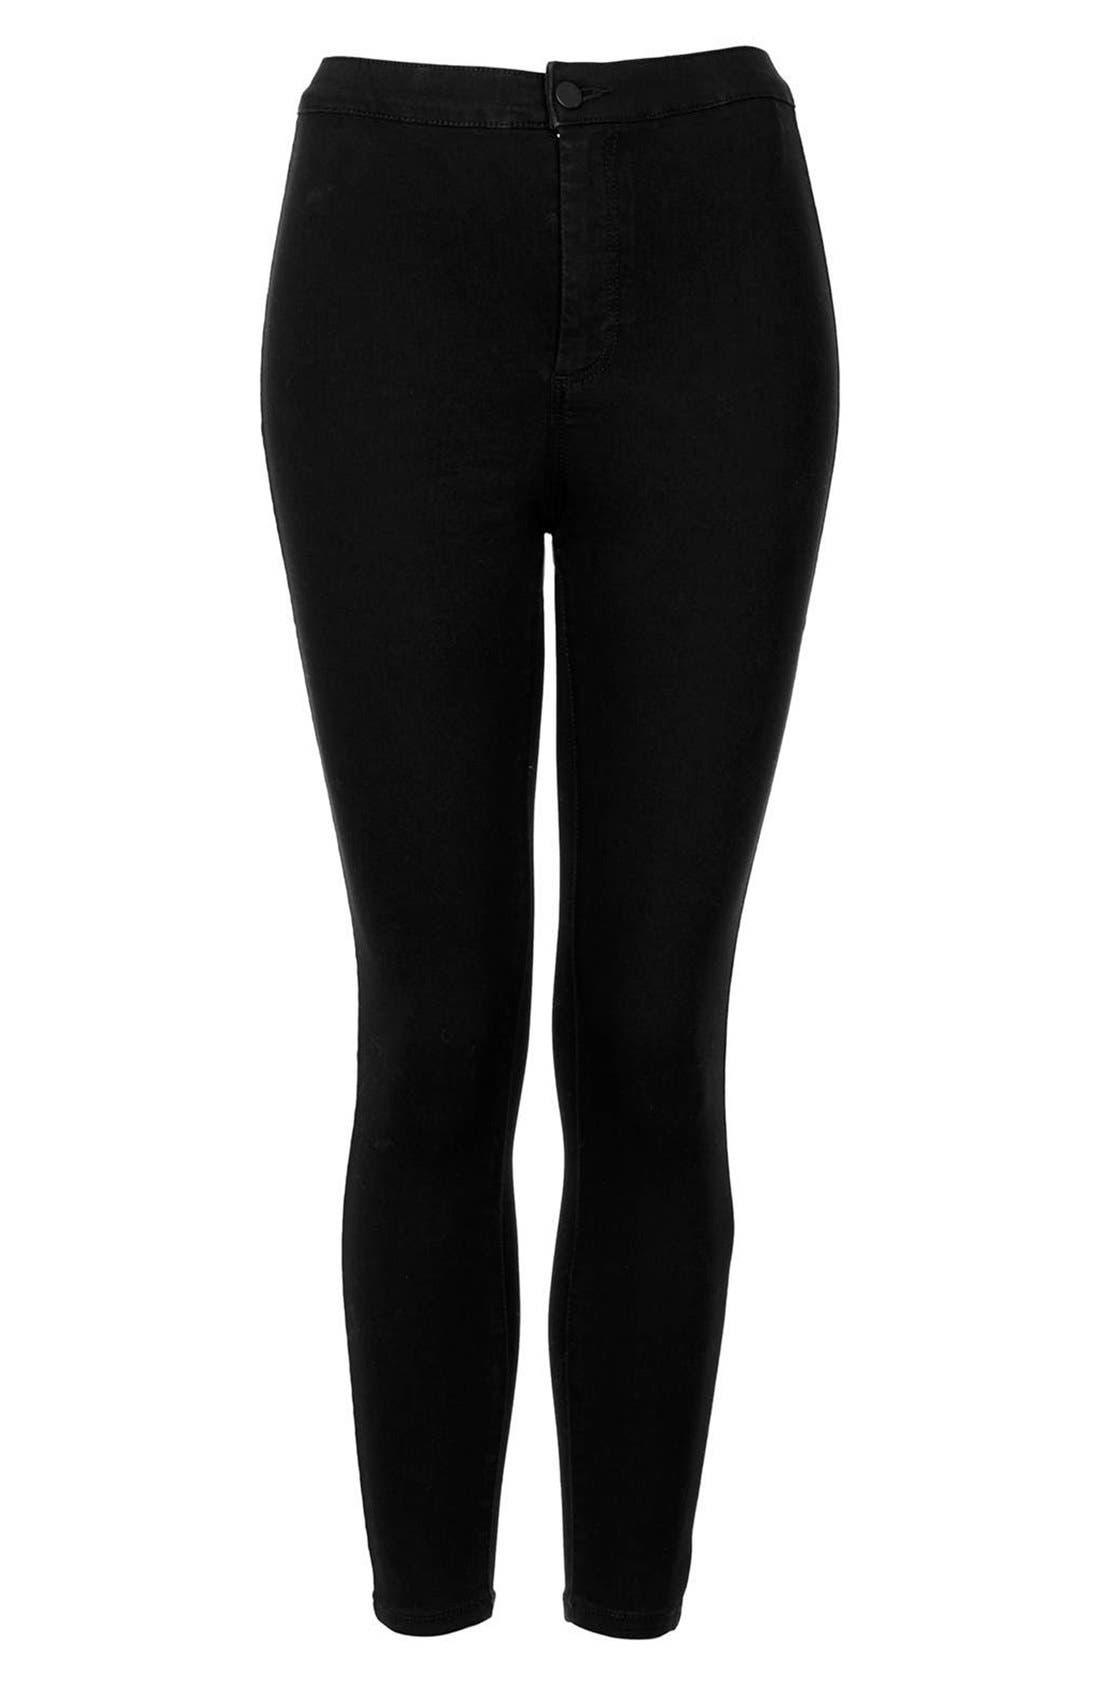 Alternate Image 3  - Topshop Moto 'Joni' High Rise Skinny Jeans (Regular & Petite)